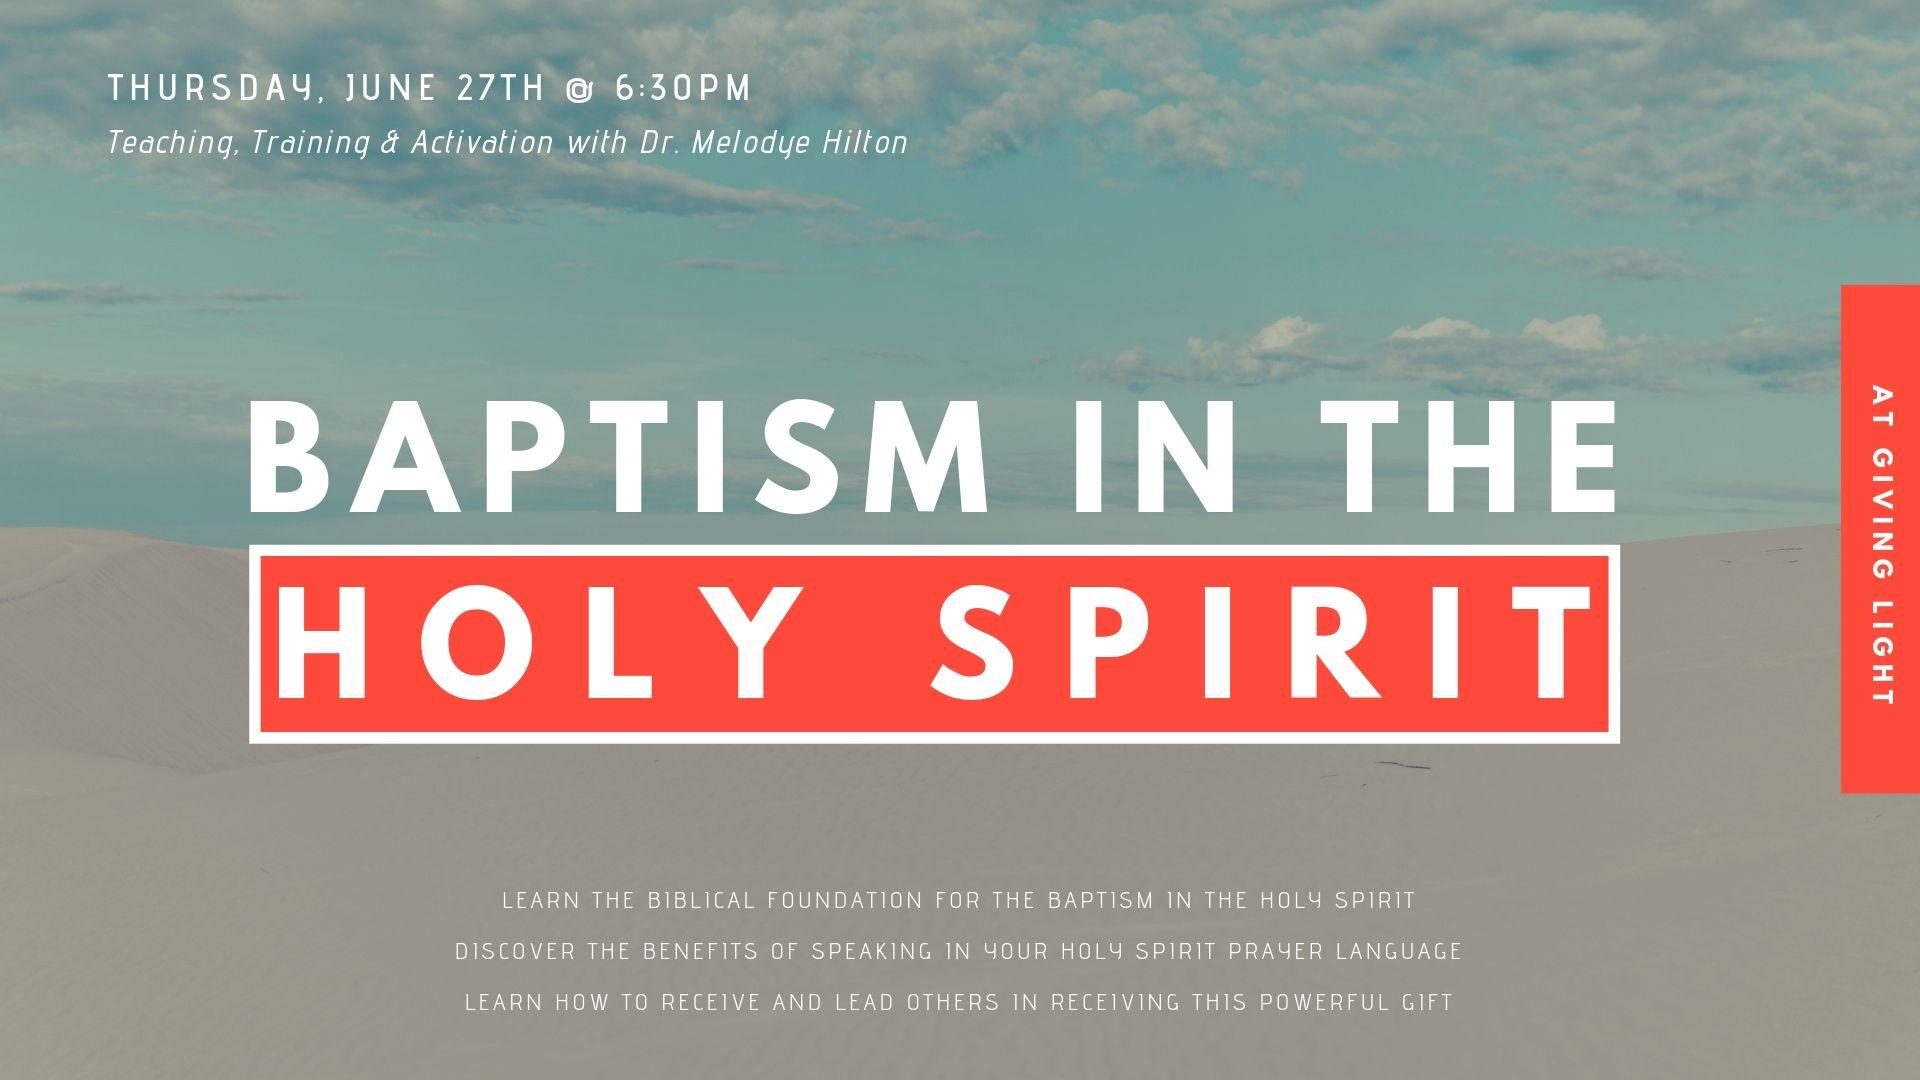 BAPTISM IN THE HOLY SPIRIT TRAINING